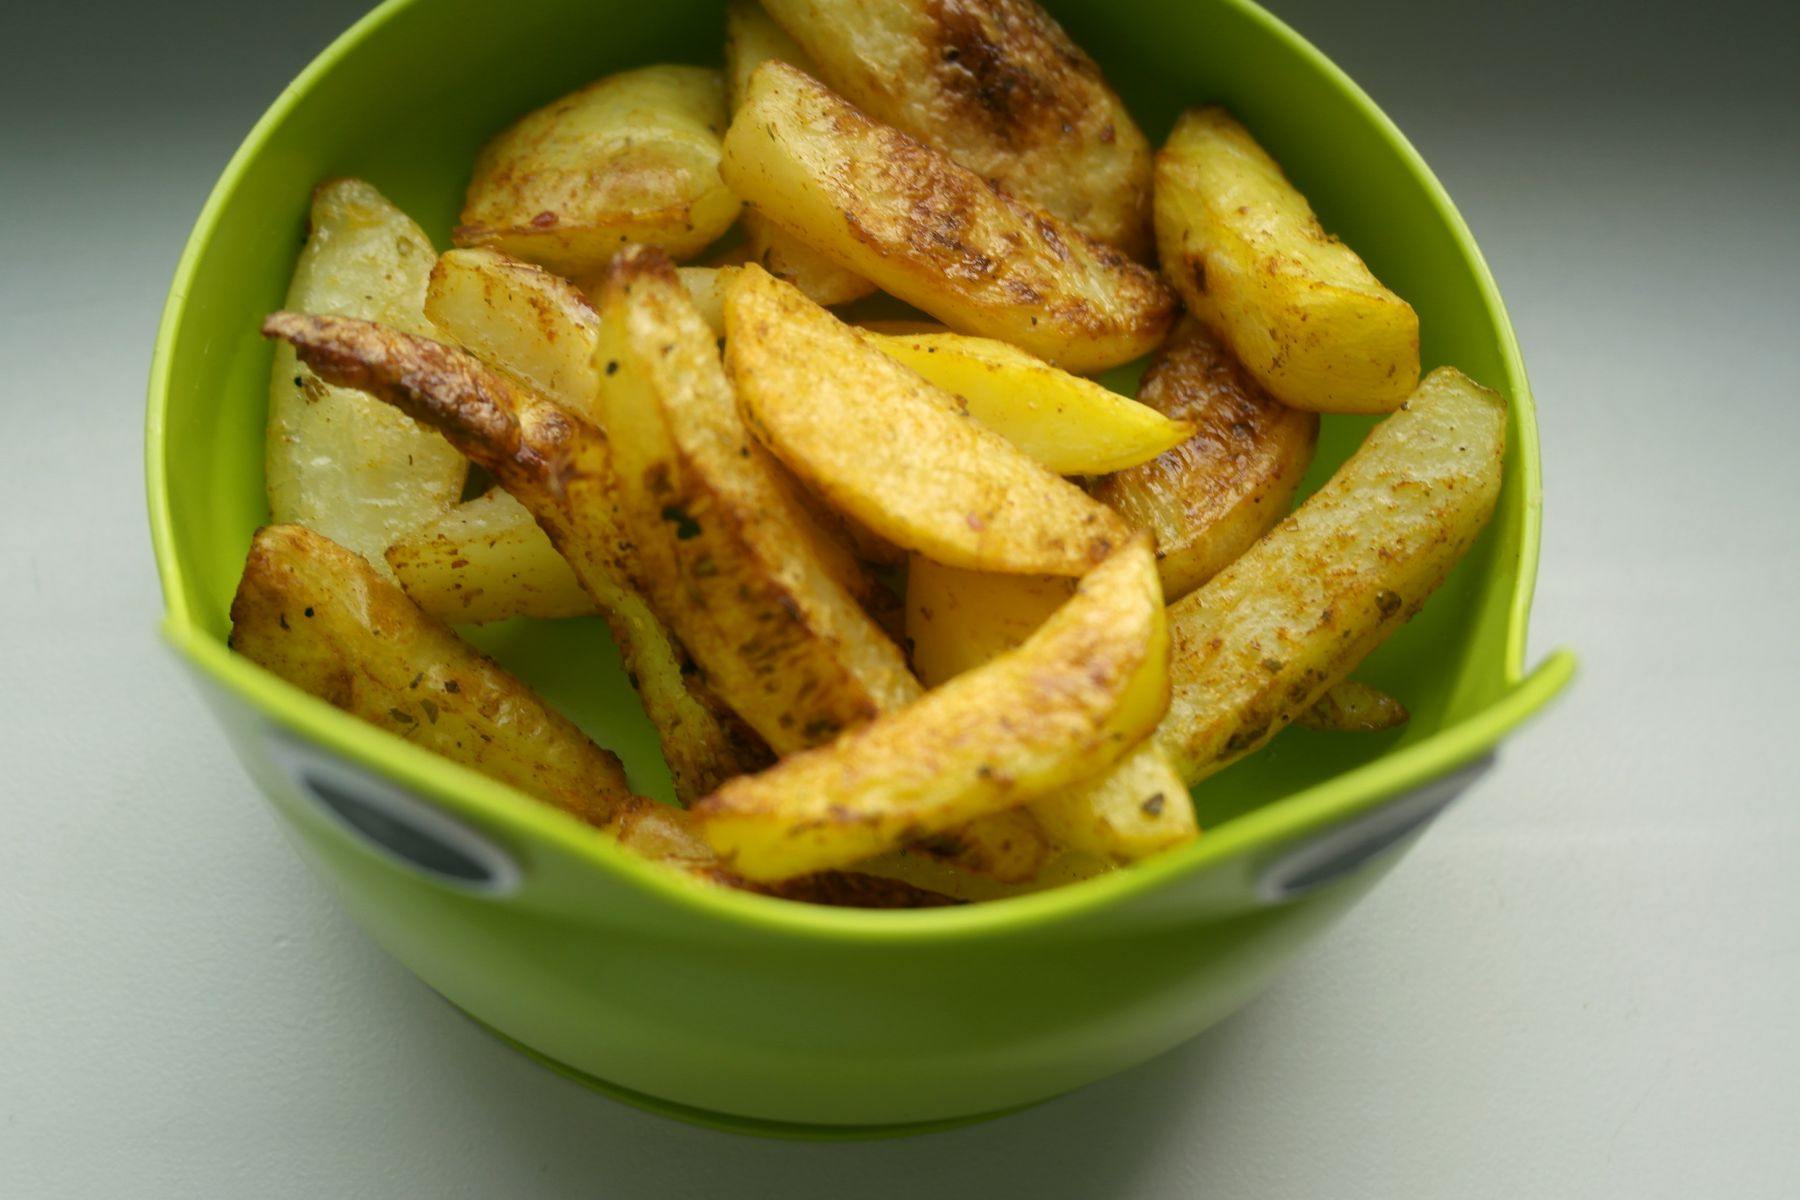 cartofi prajiti sanatosi diversificare retete copii